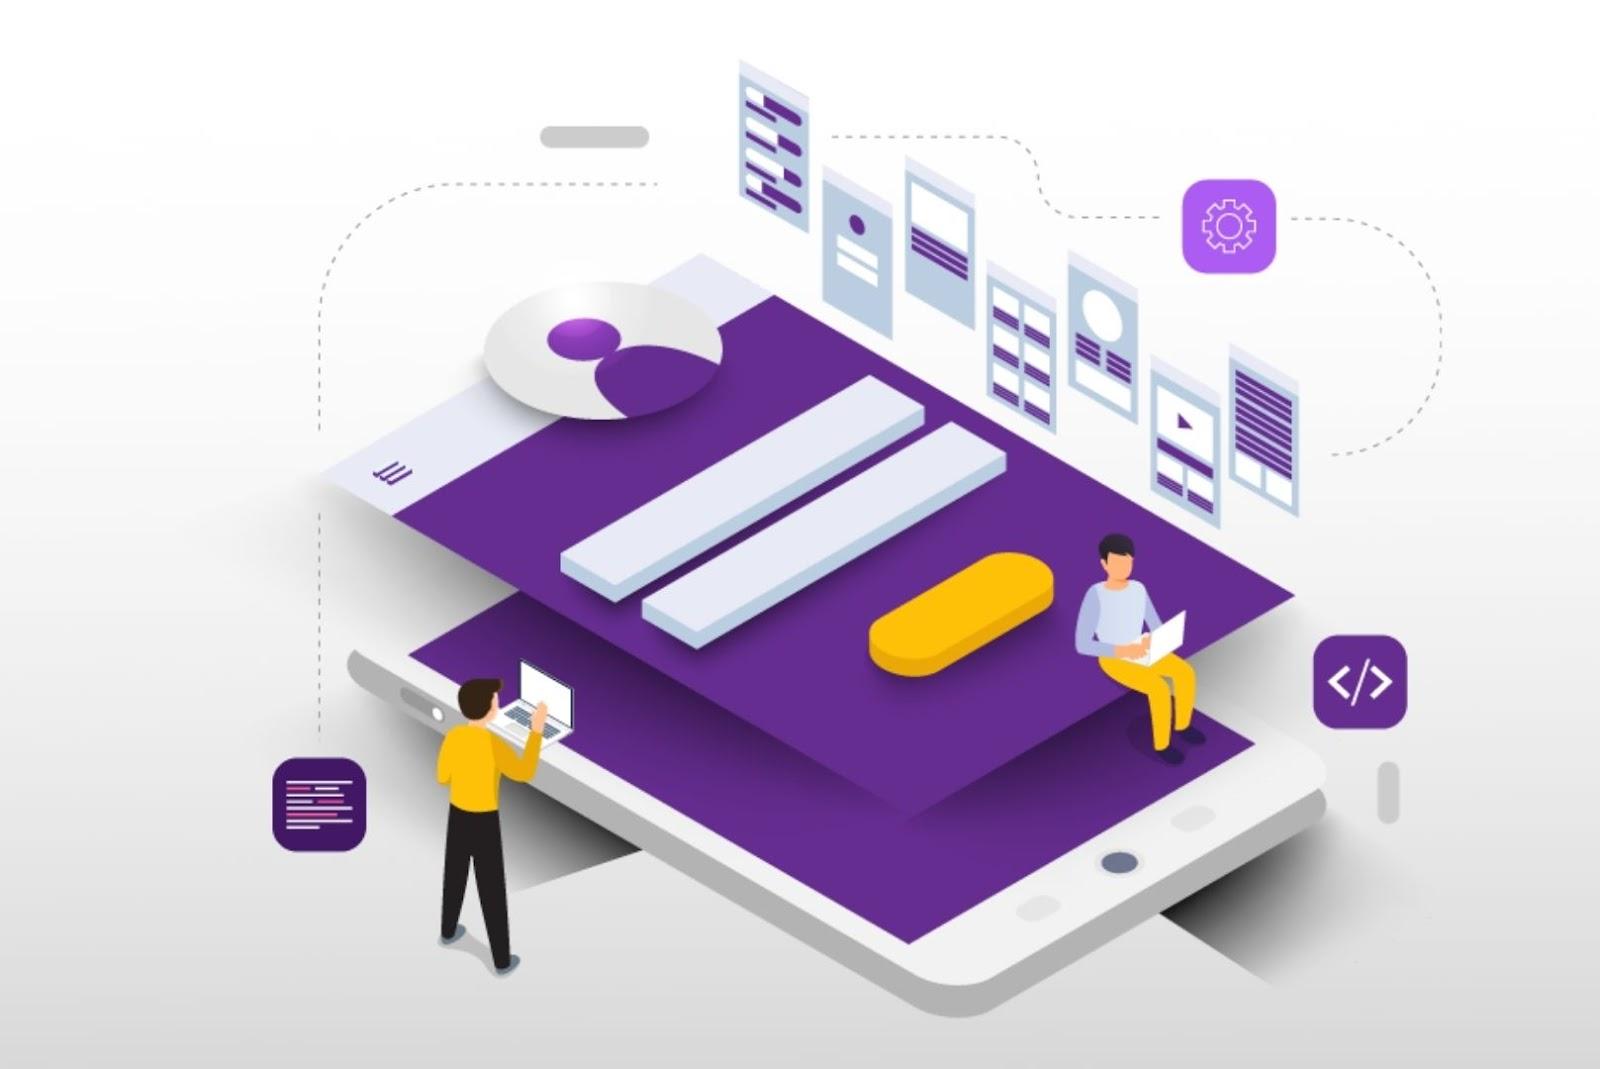 Mobile-first development